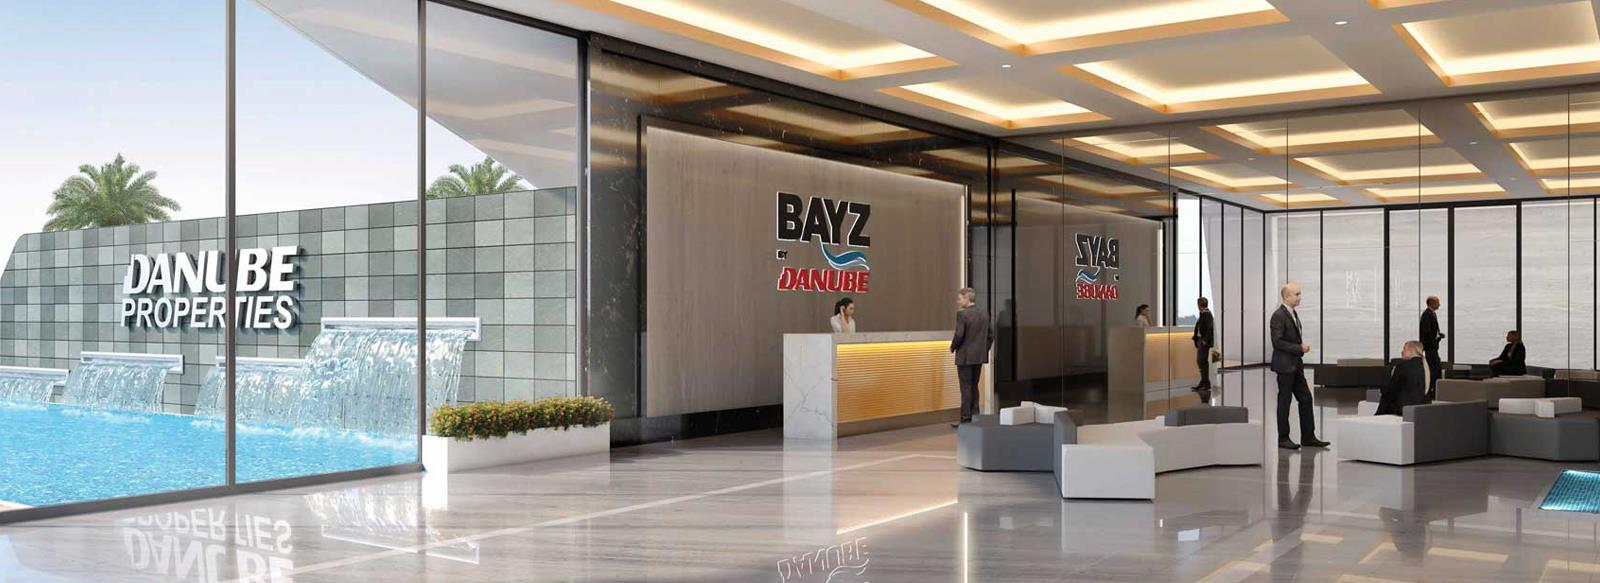 Bayz Apartments Business Bay, Dubai